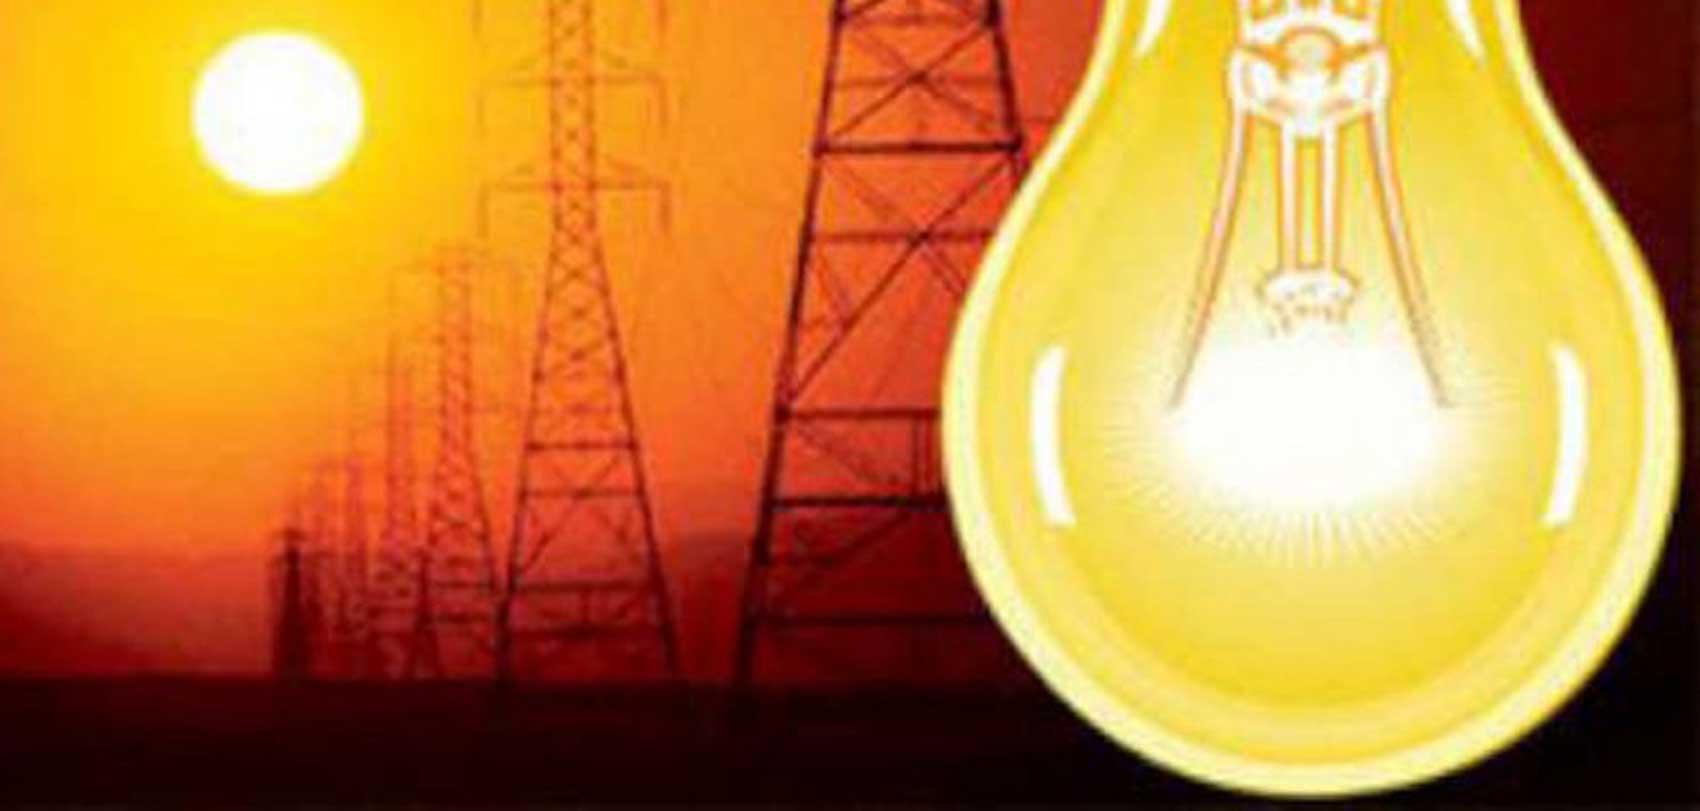 मोदीखोला जलविद्युत् आयोजनाबाट बिजुली उत्पादन शुरु